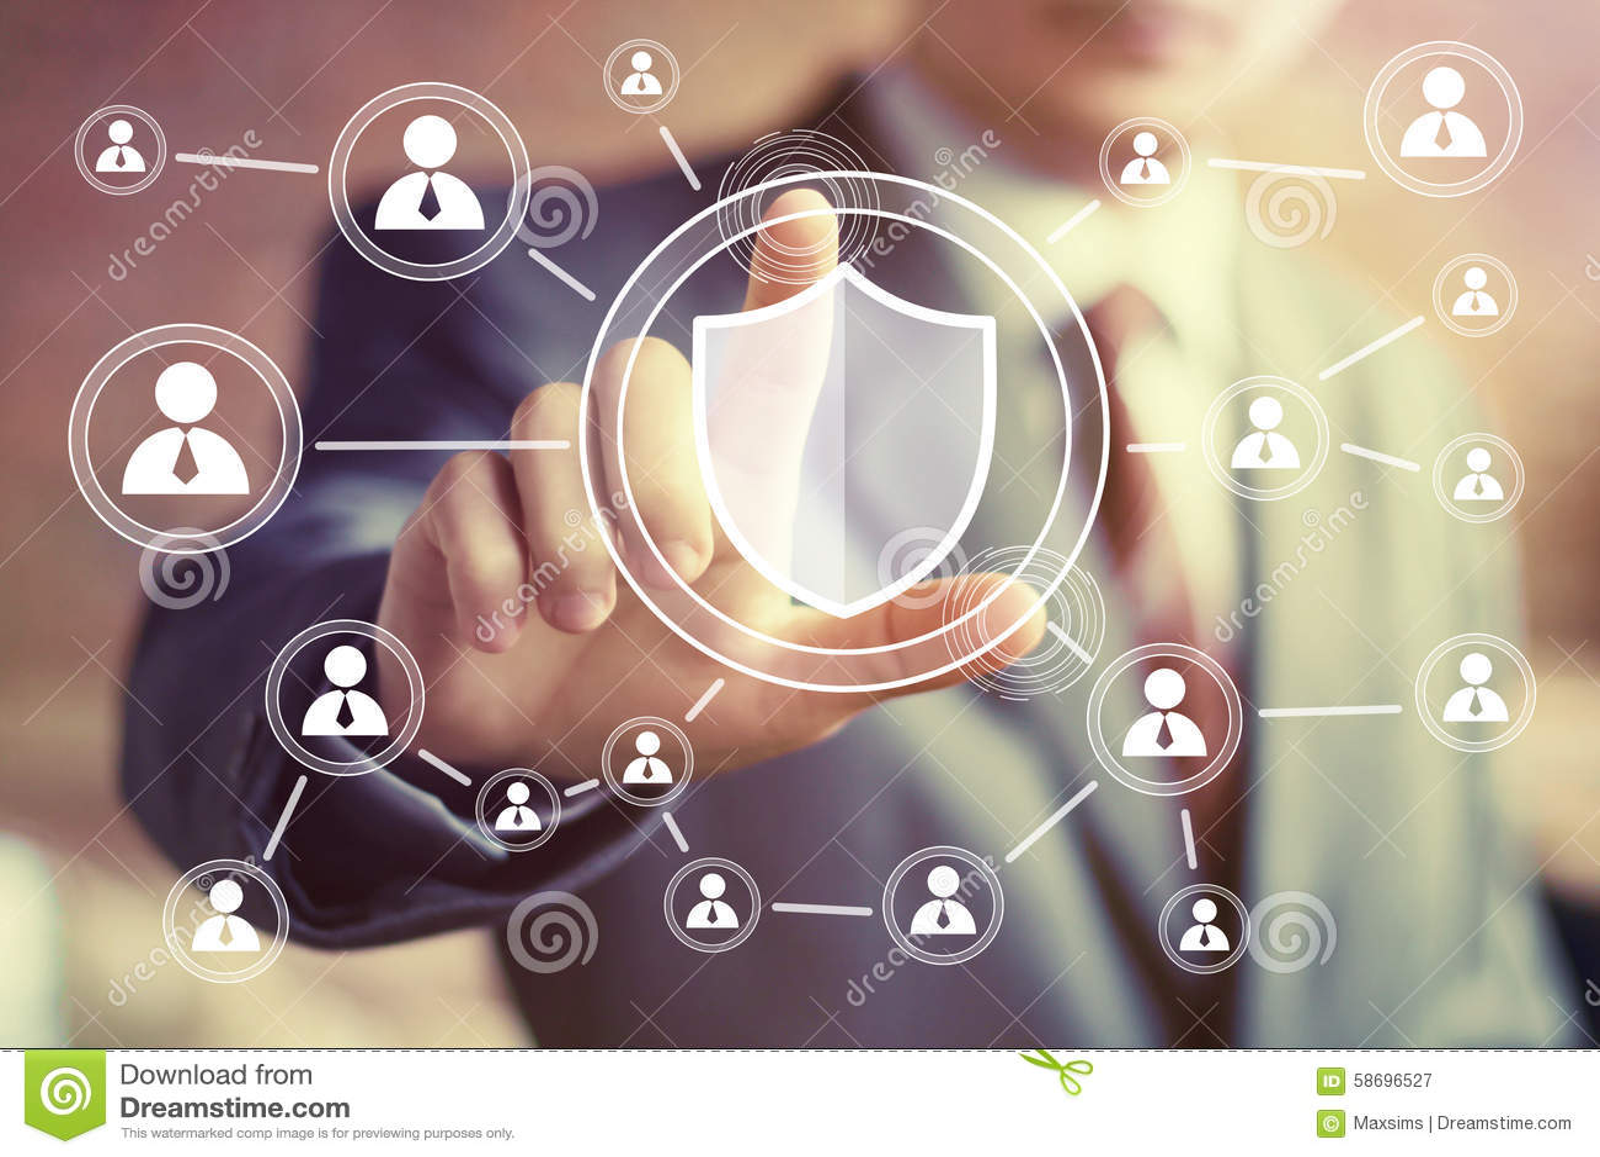 Businessman hand press shield security virus online button icon